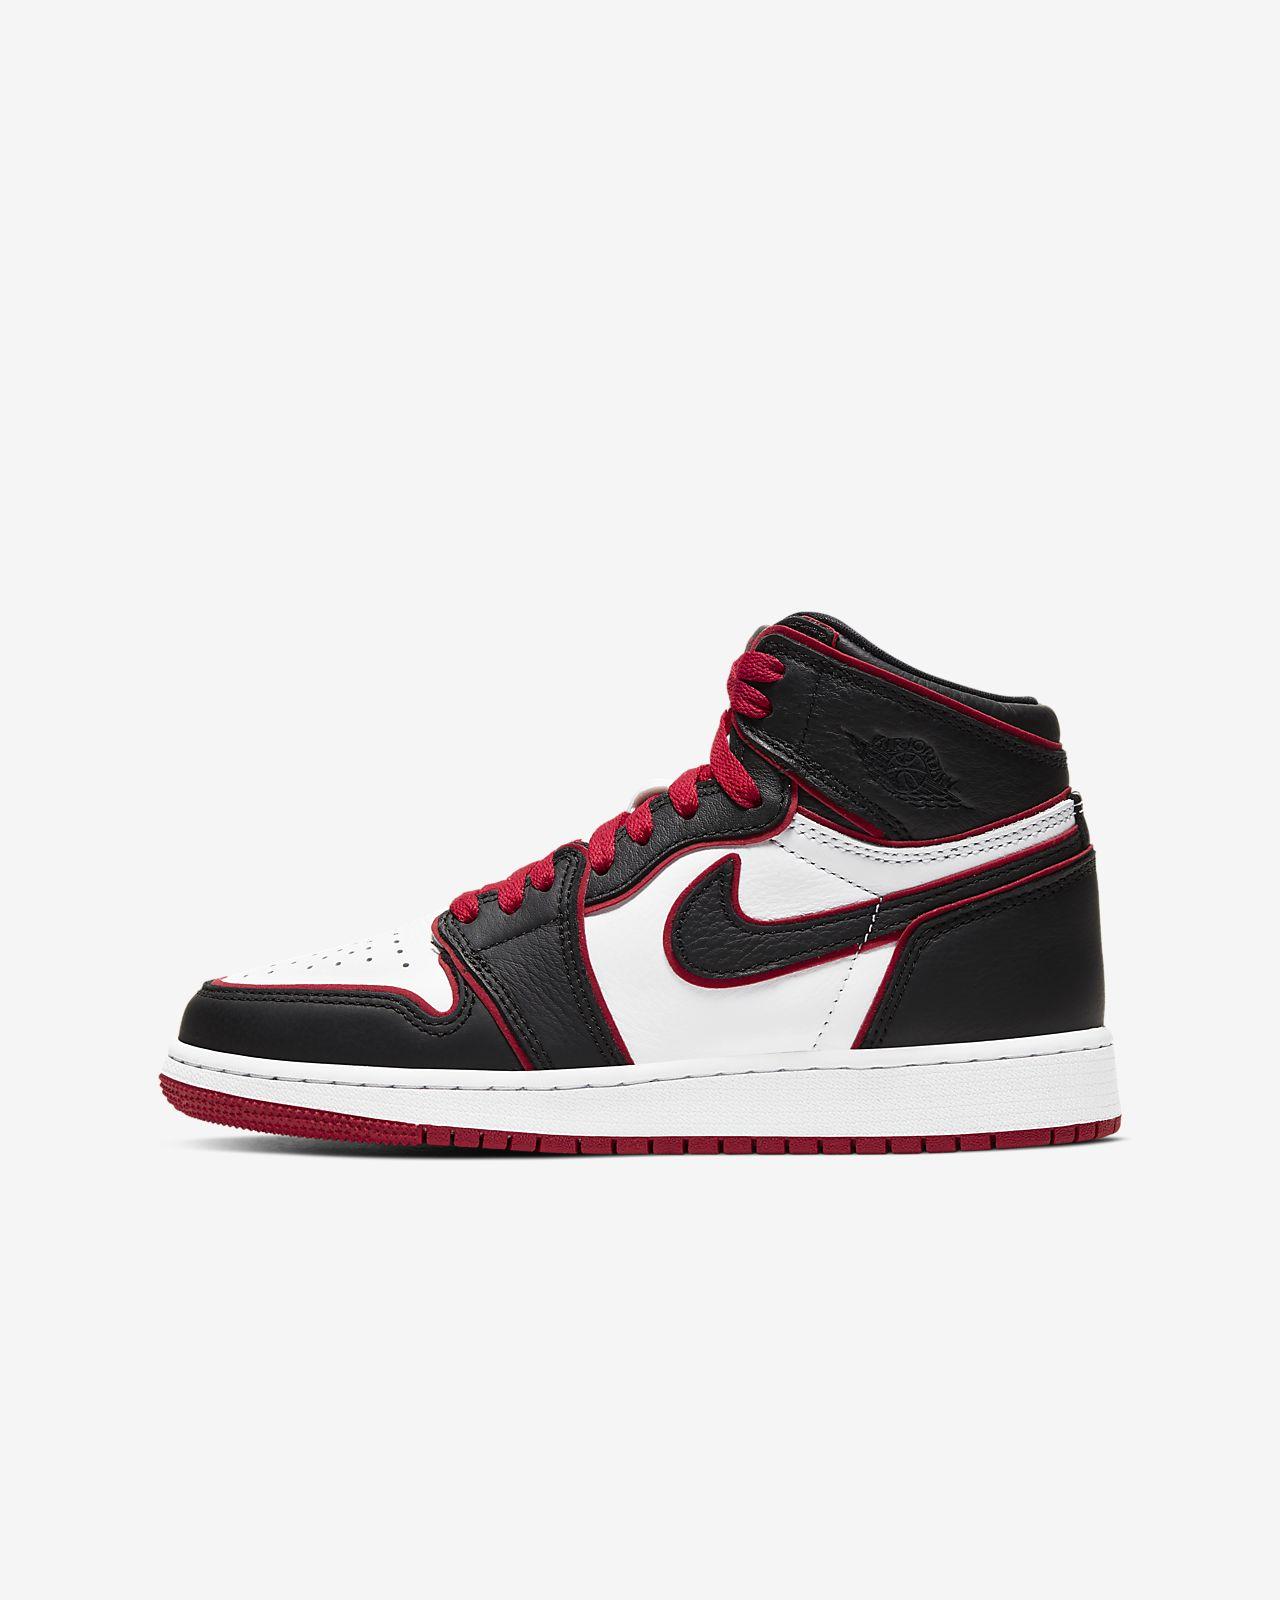 Nike Air Nike Michael jordan 3.5 High Heels In Pink White